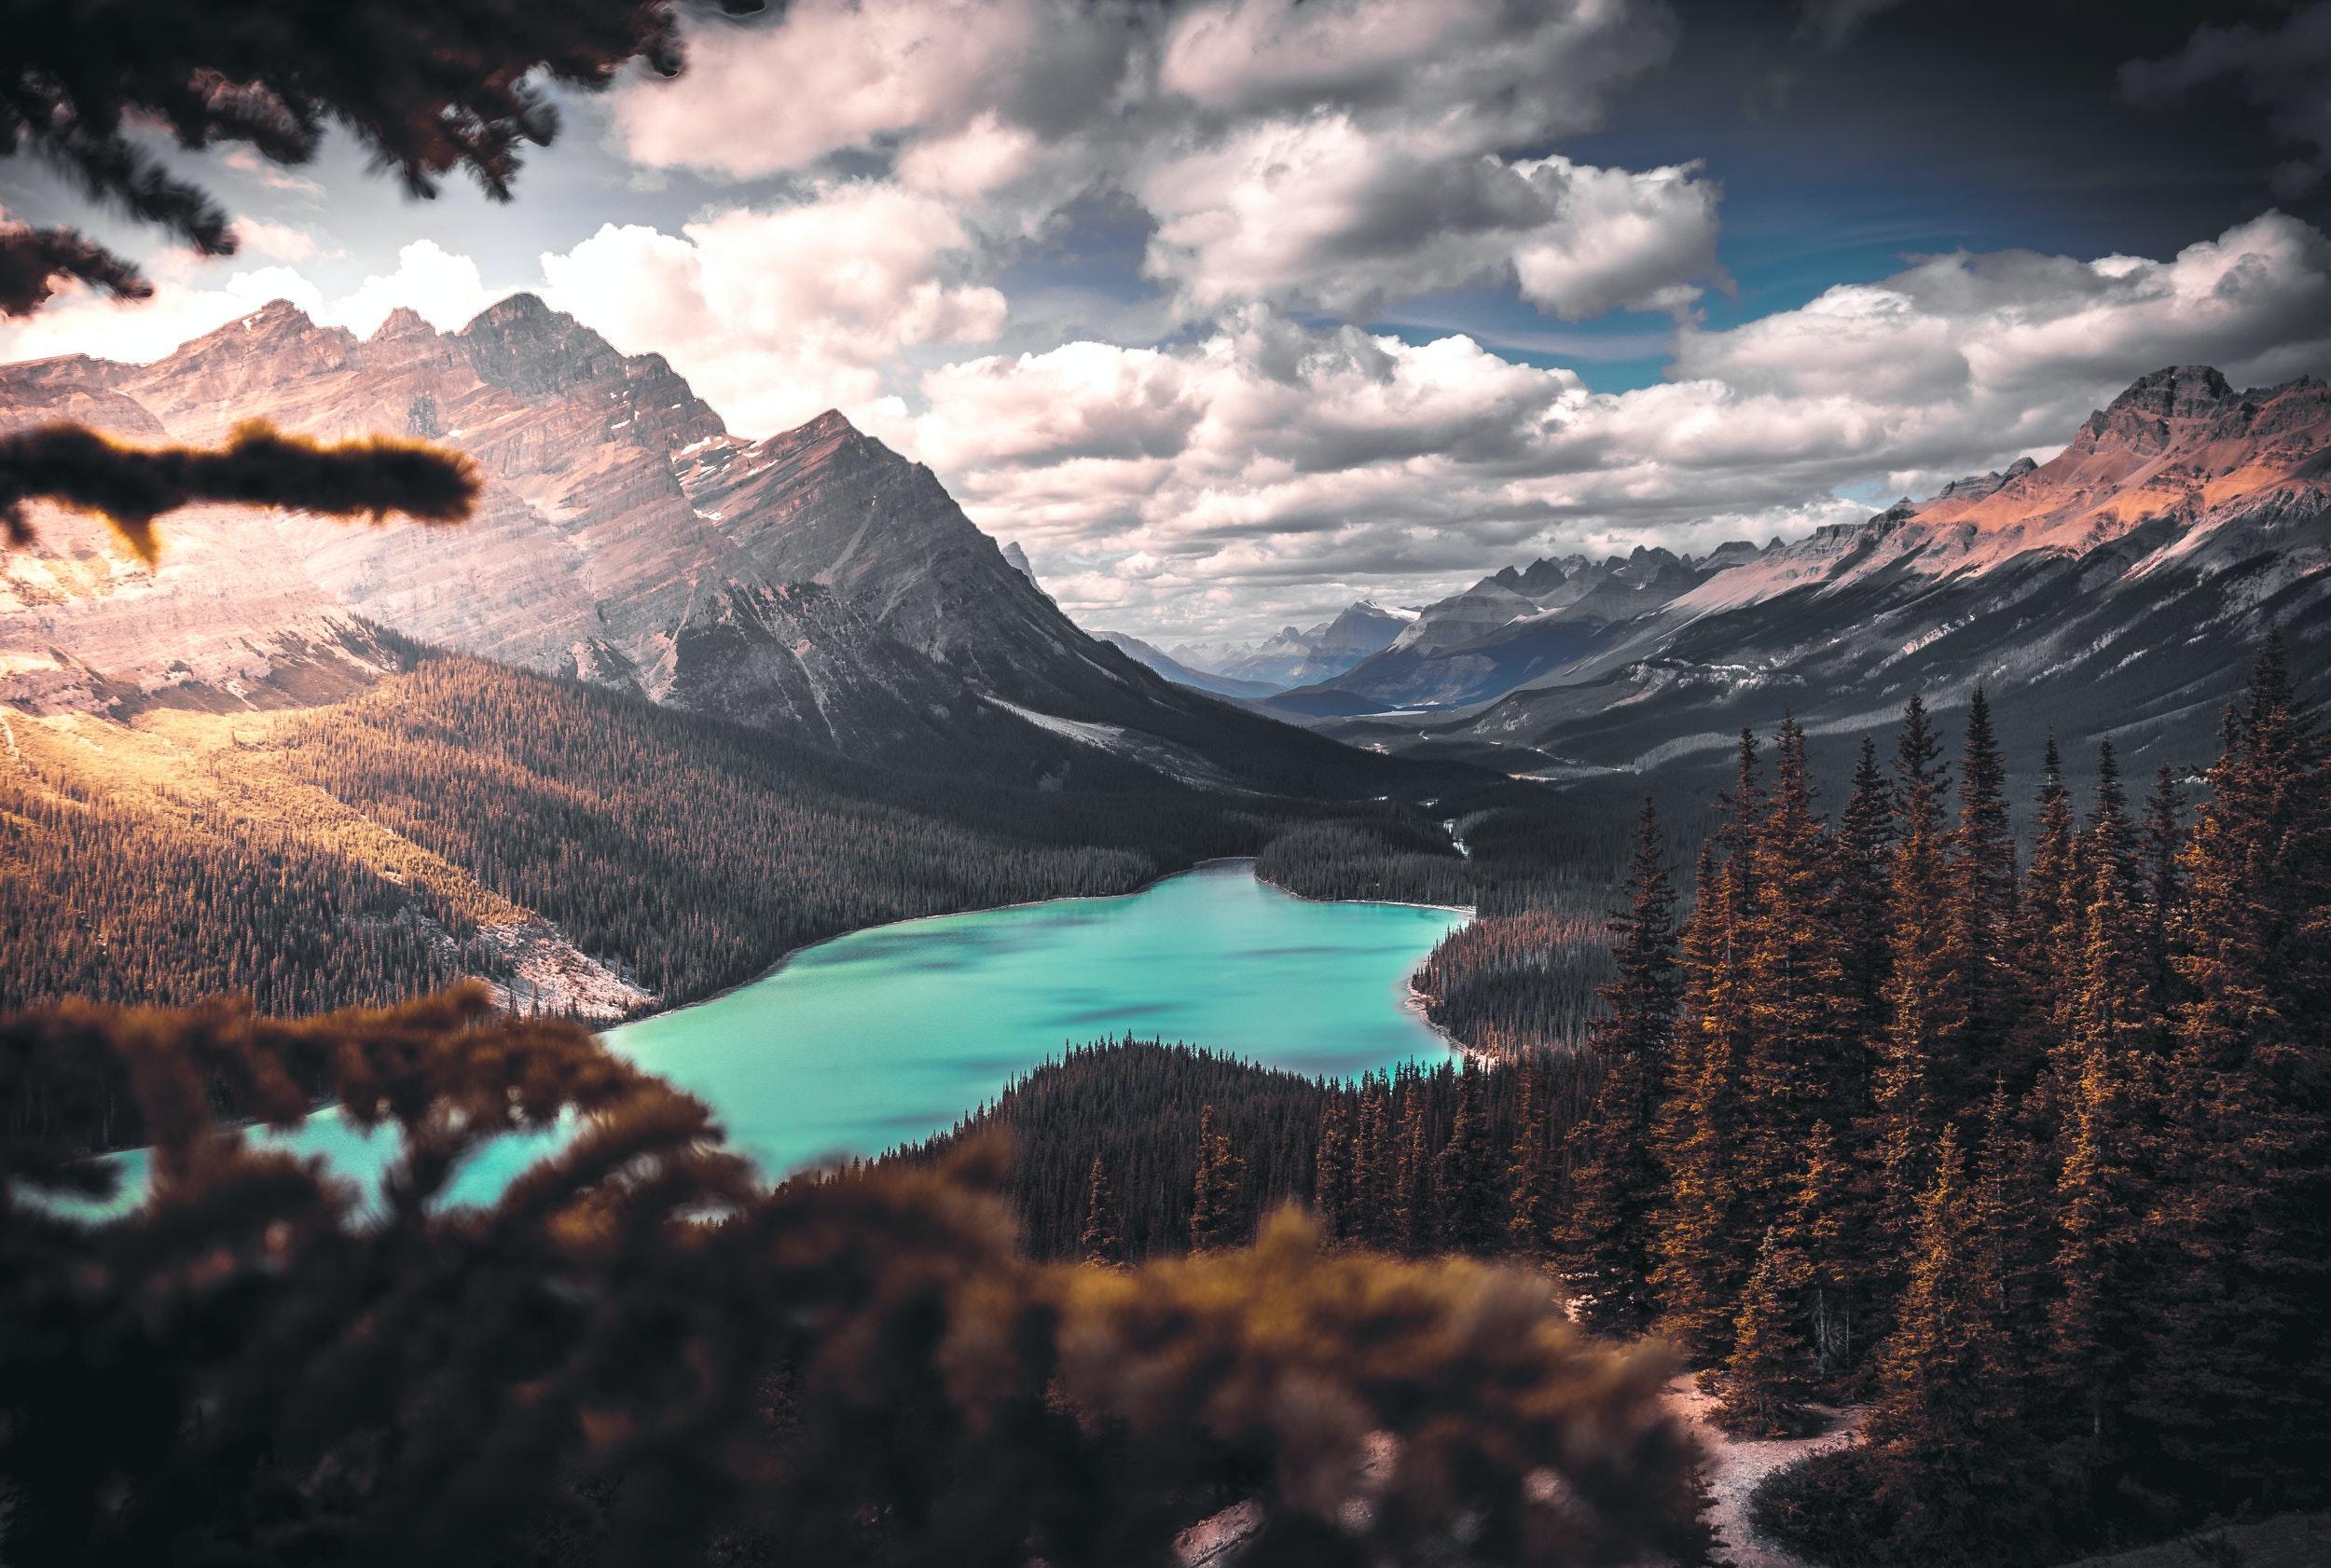 Top 20 R Wallpaper Love: Desktop Backgrounds · Pexels · Free Stock Photos